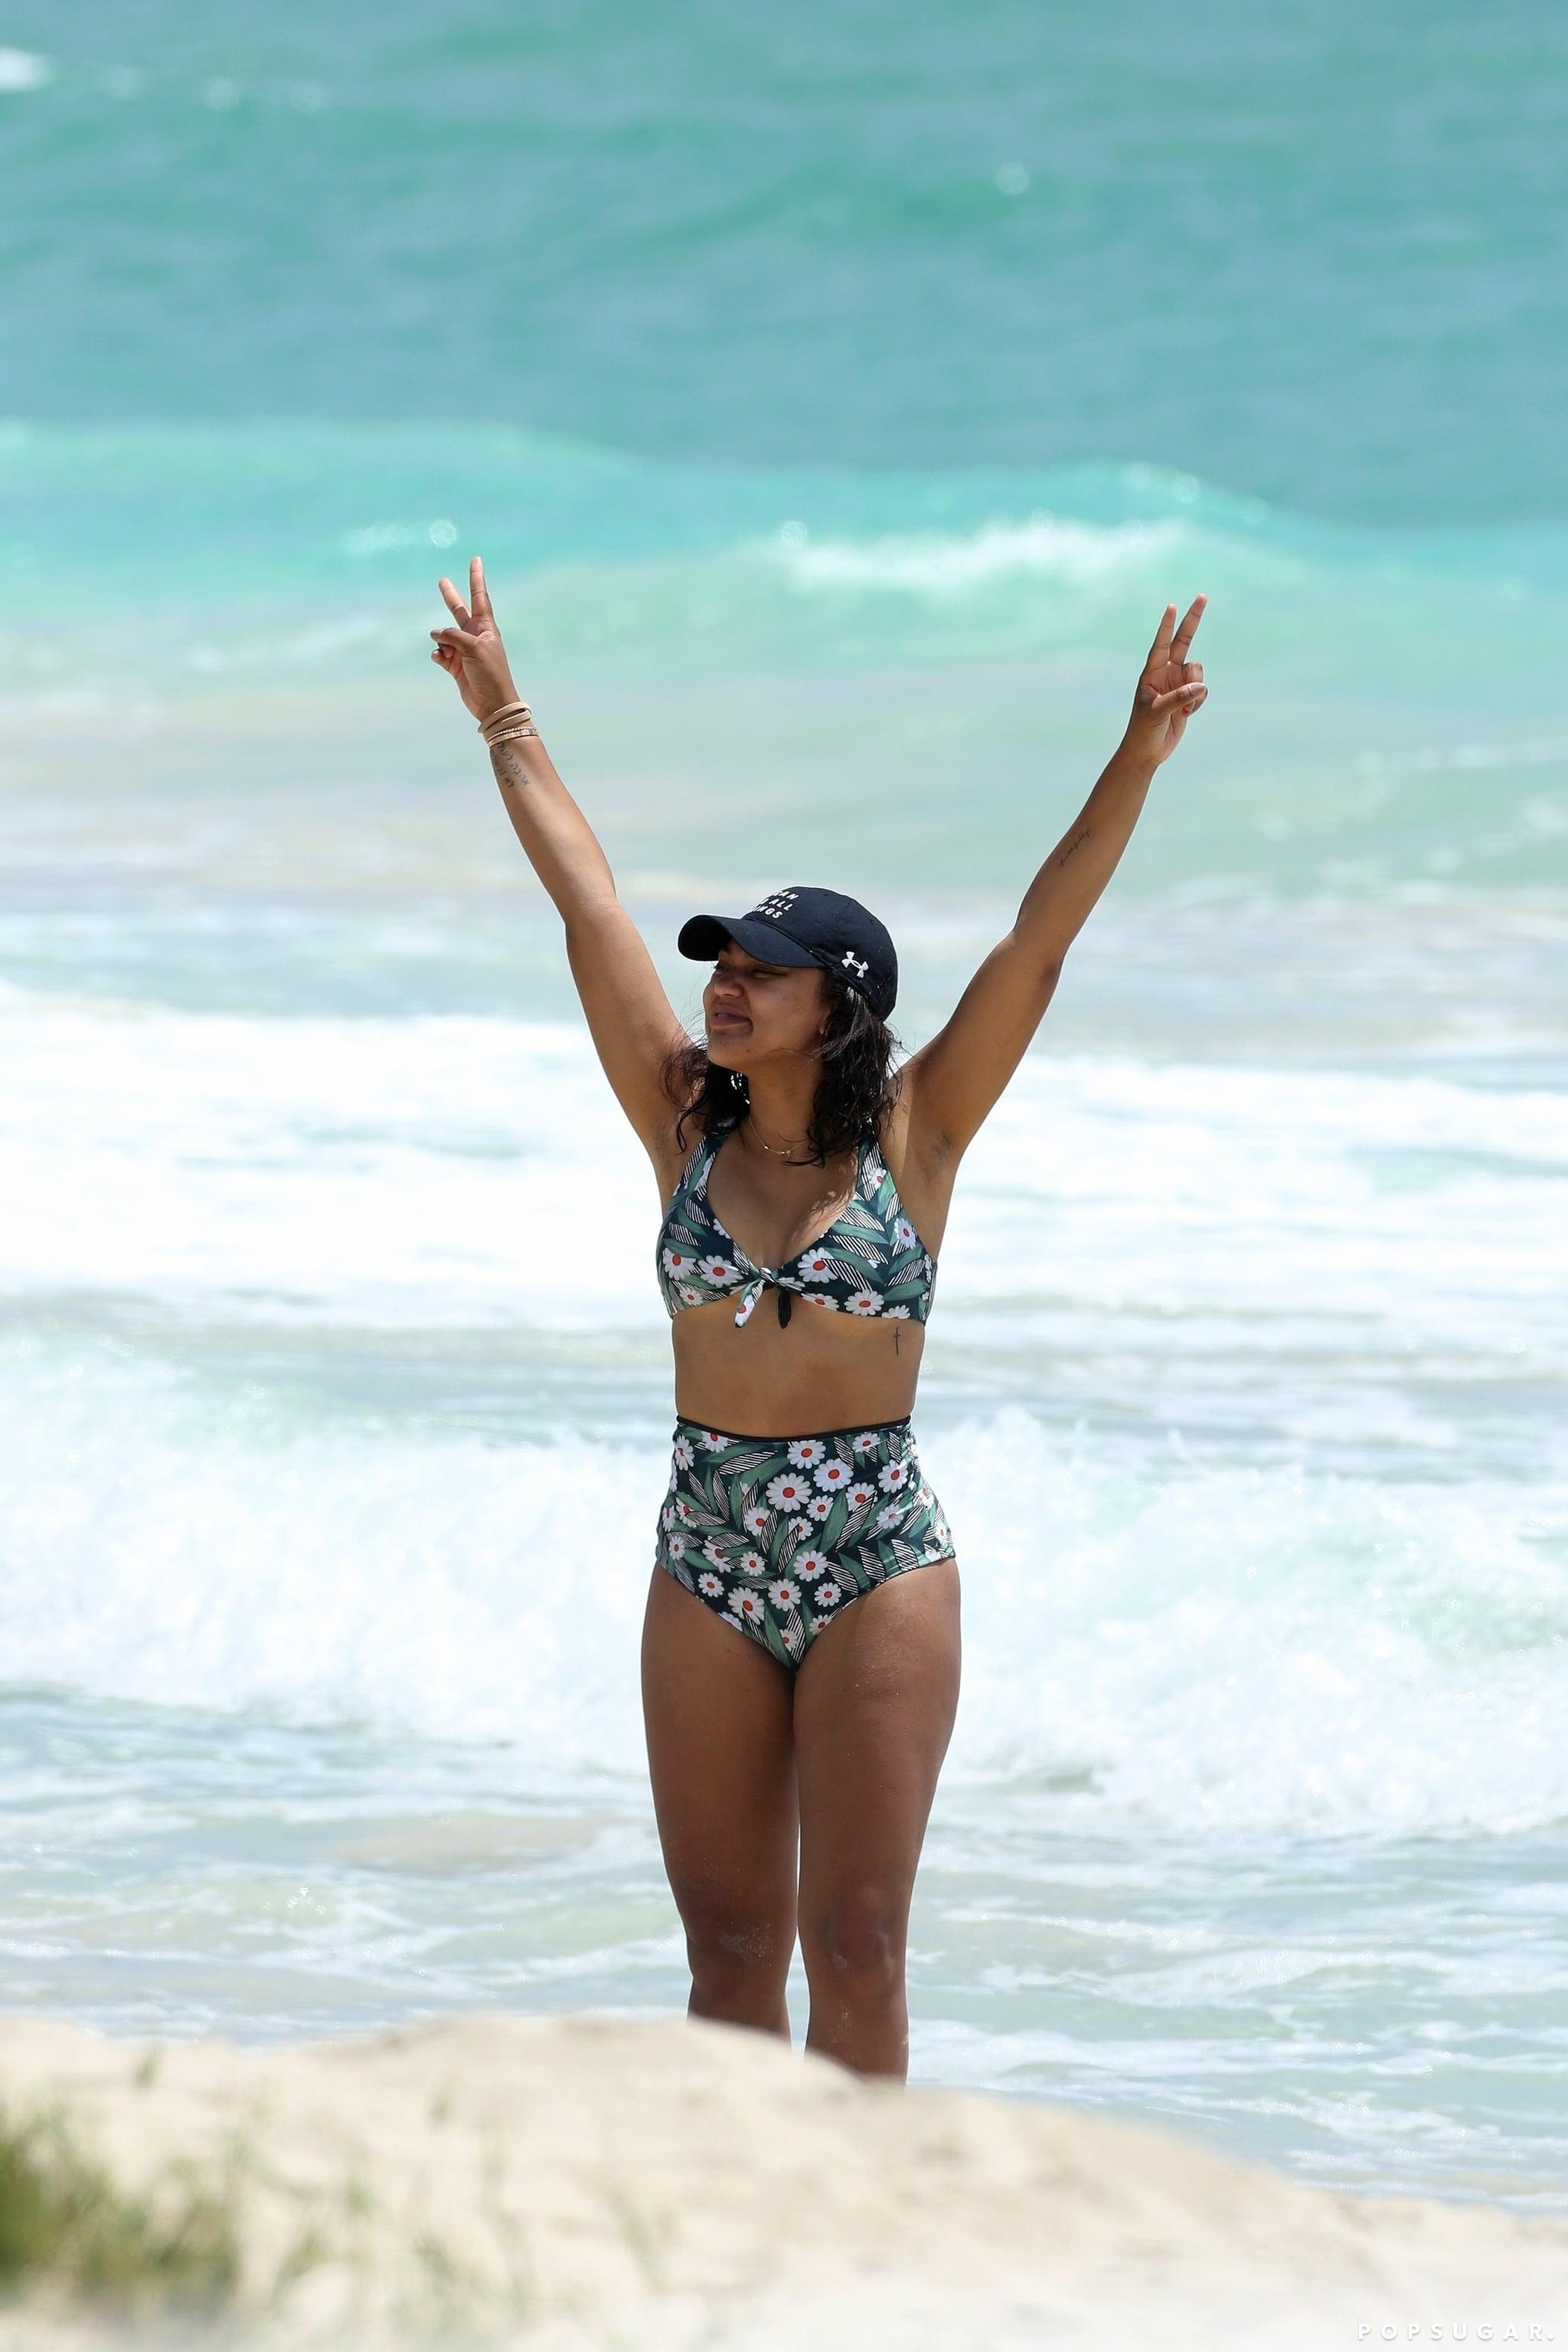 Ayesha Curry 2017s Sexiest Bikini Moments Are Guaranteed To